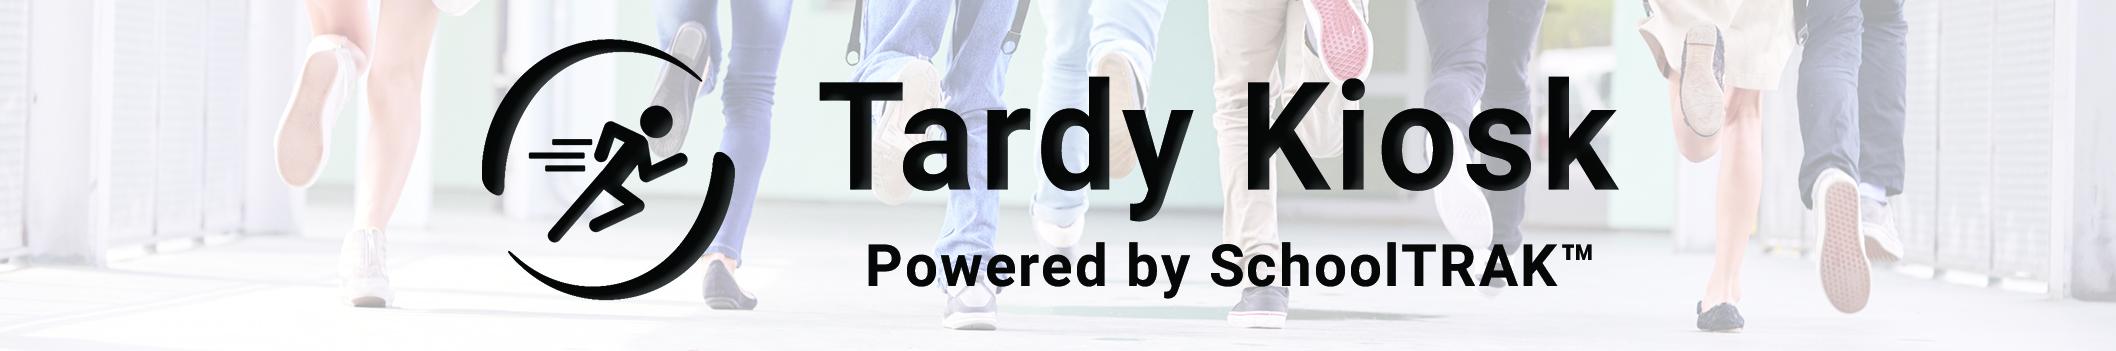 Tardy Kiosk powered by SchoolTRAK for Skyward Qmlativ Banner